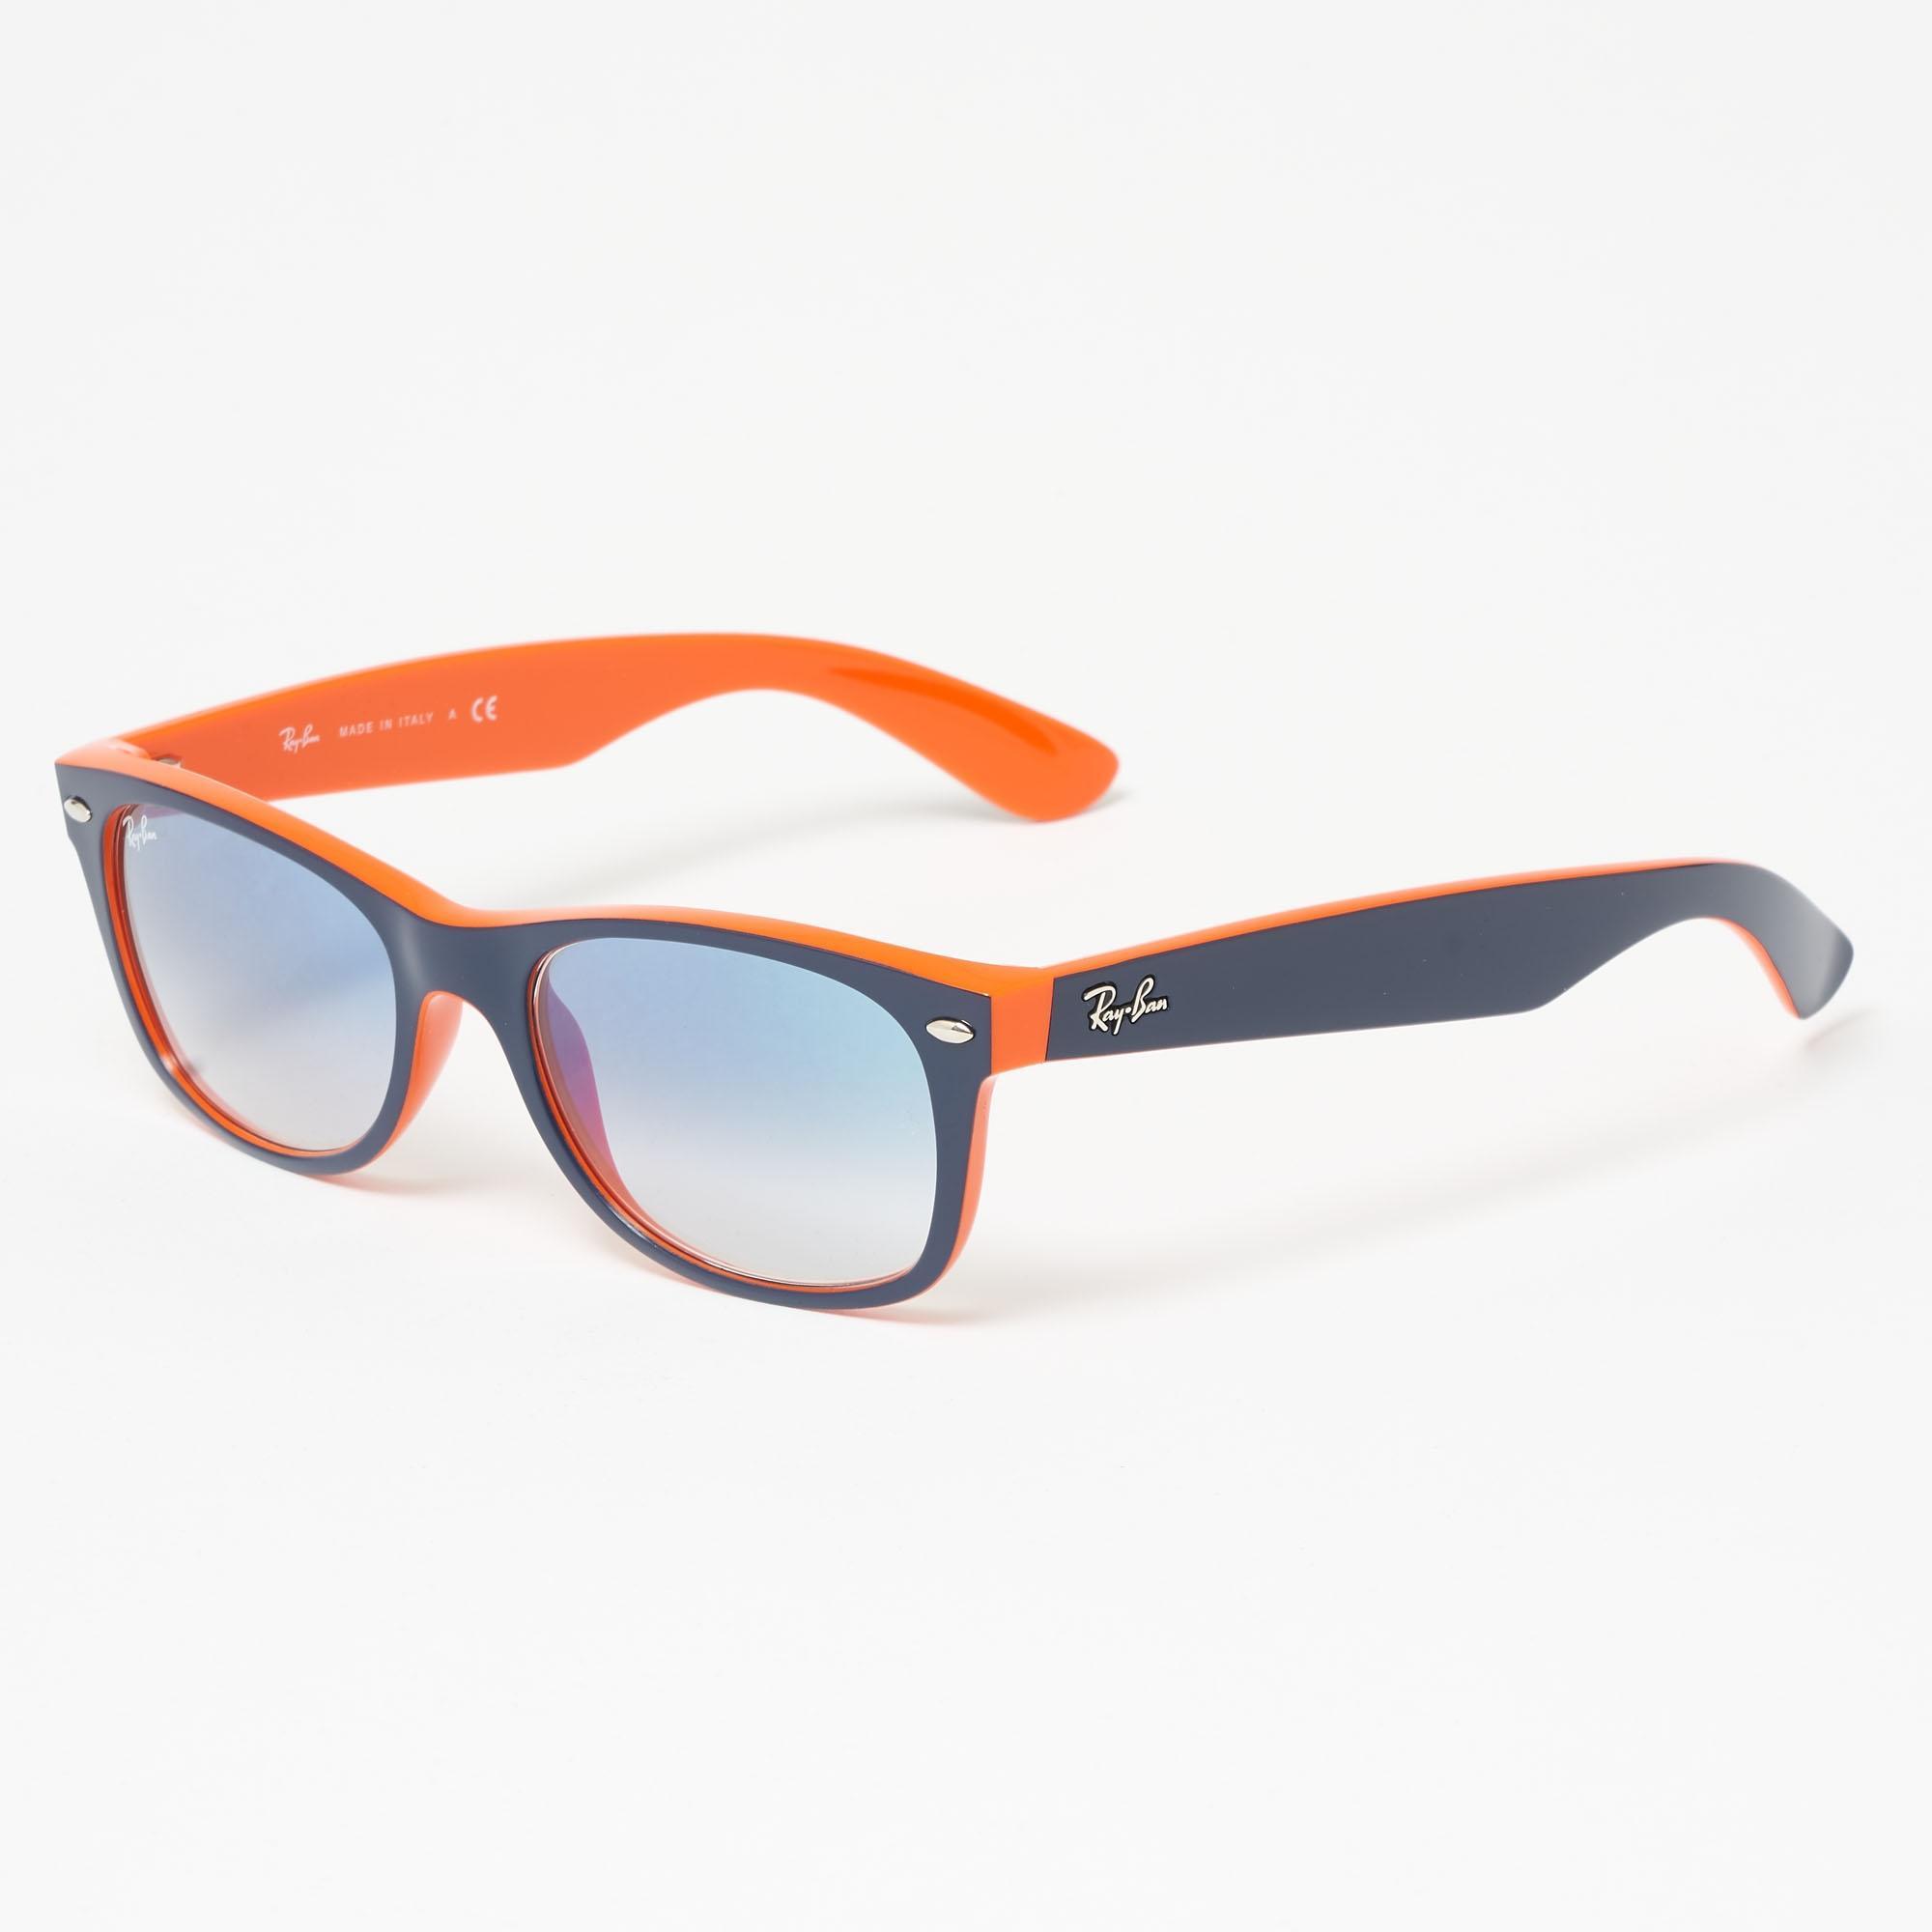 8208350c1 ... official ray ban. mens blue orange new wayfarer 9ae0a 5febb ...